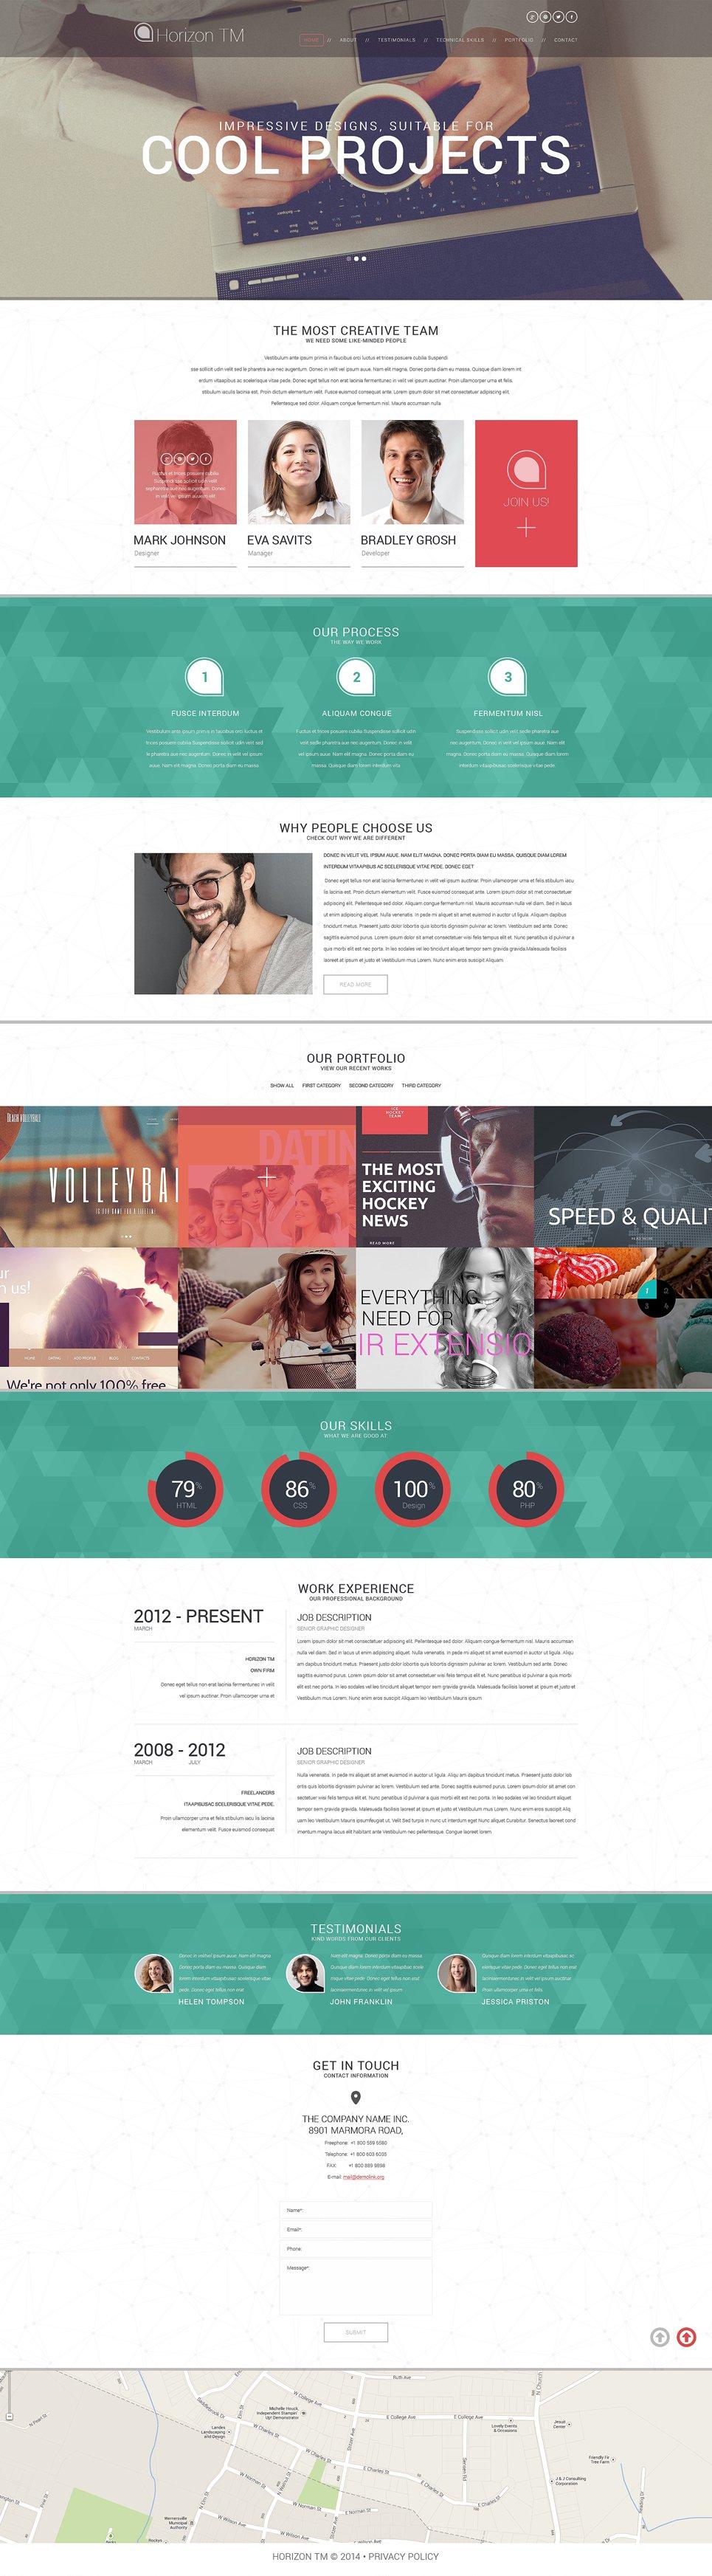 Адаптивный шаблон сайта на тему дизайн студия #51001